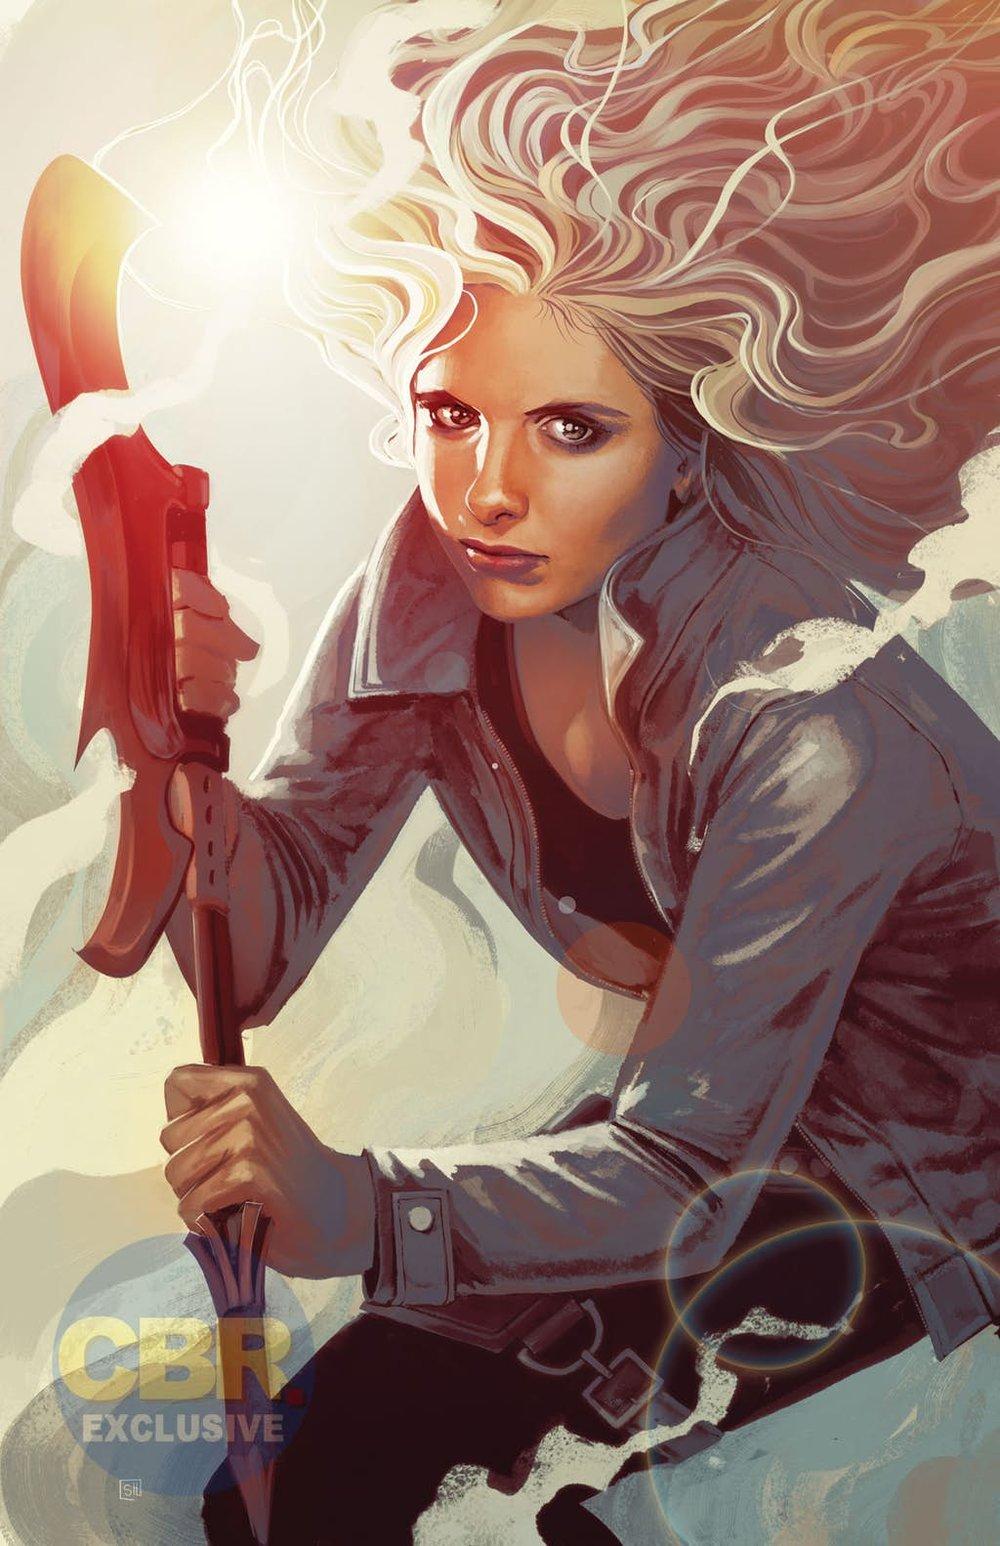 joss-whedon-returns-to-buffy-the-vampire-slayer-for-season-12-comic1